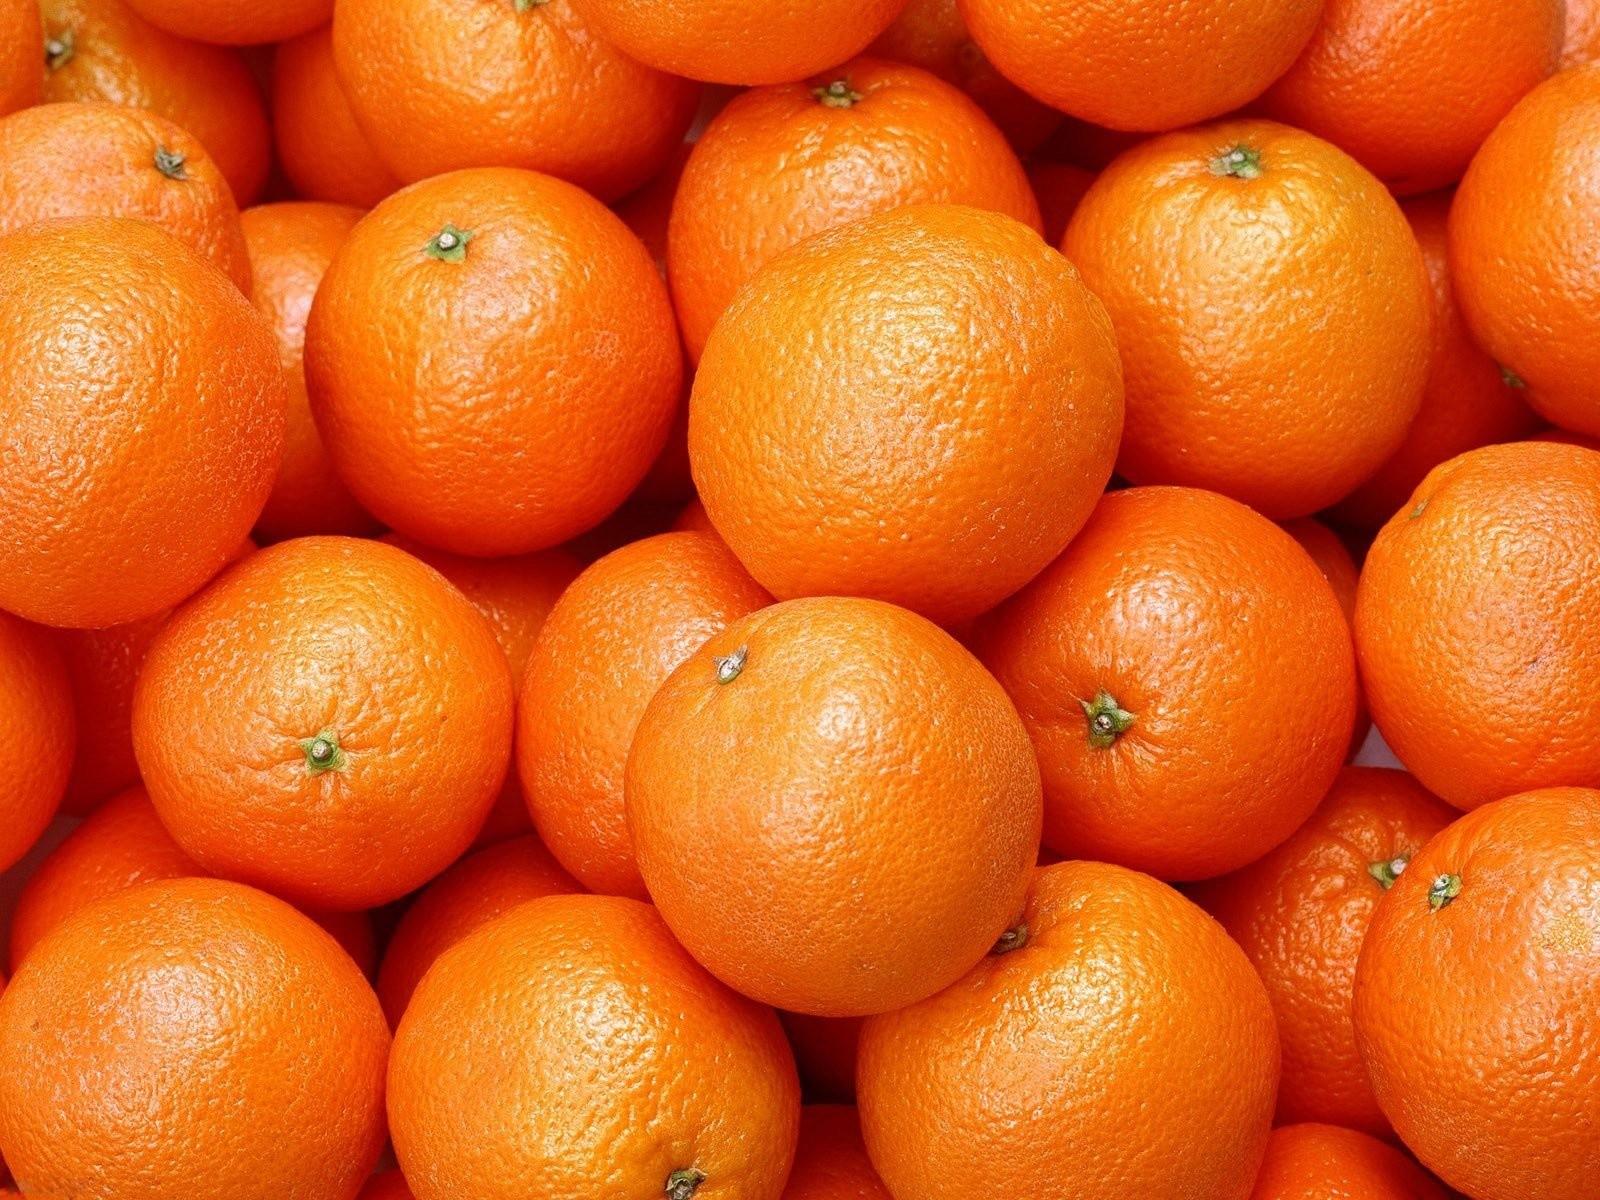 fruits food oranges